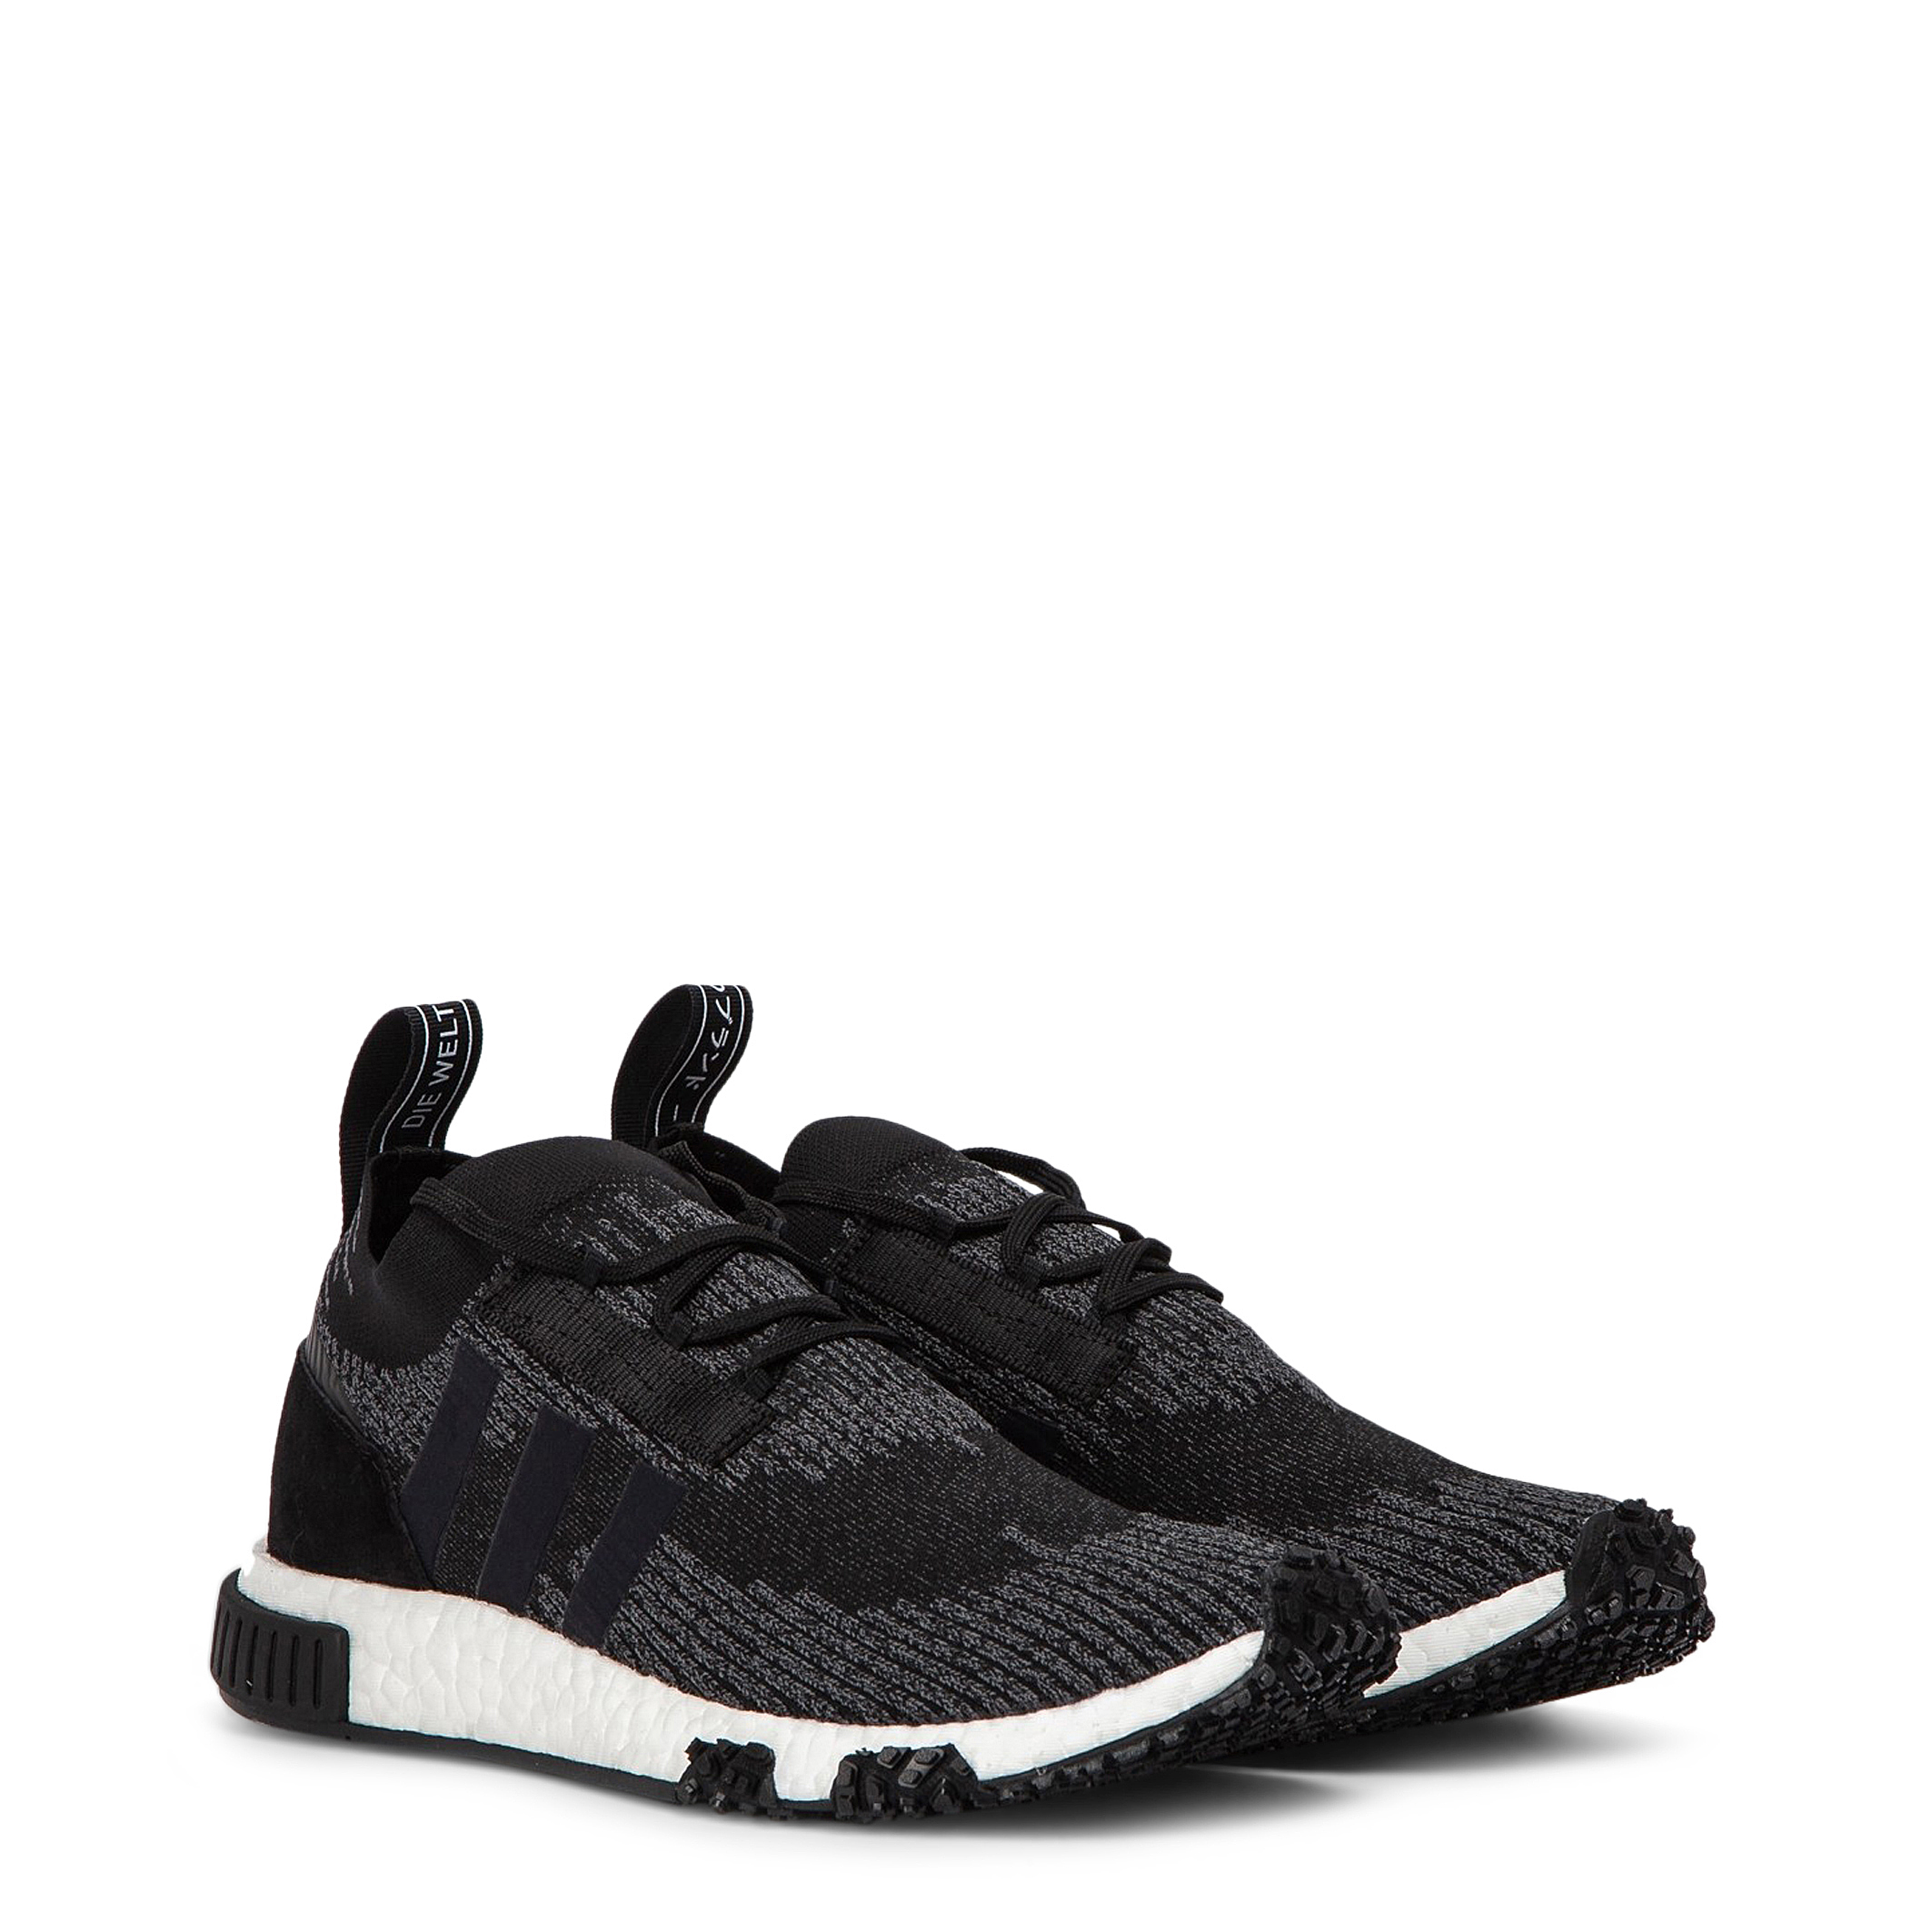 Sneakers Adidas NMD-RACER Unisex Nero 101534